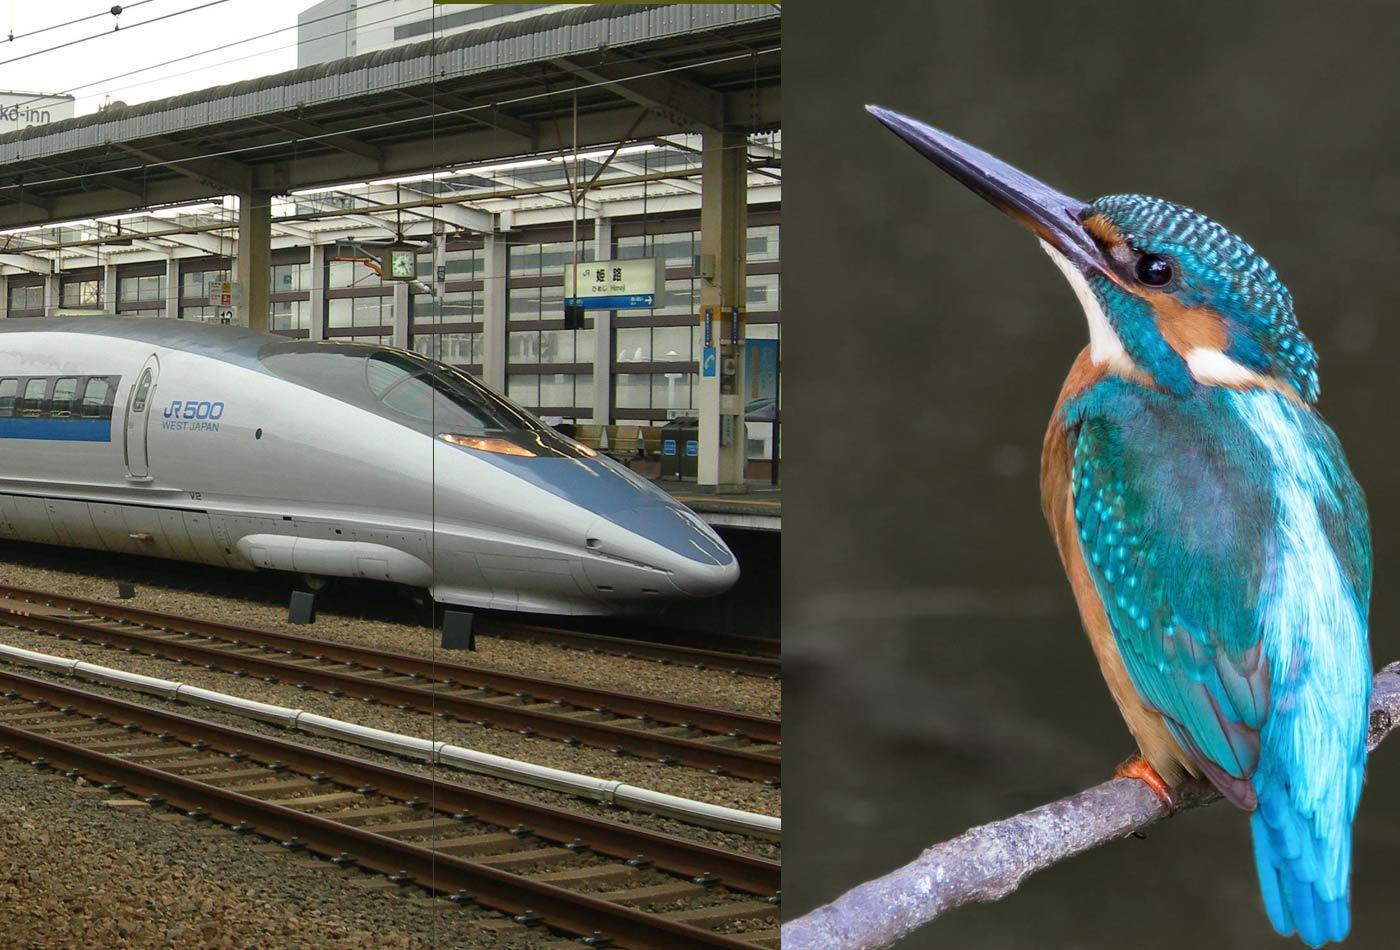 Left: a JR West 8-car 500 Series Shinkansen train; Right: Common kingfisher, whose beak inspired the train's nose design.